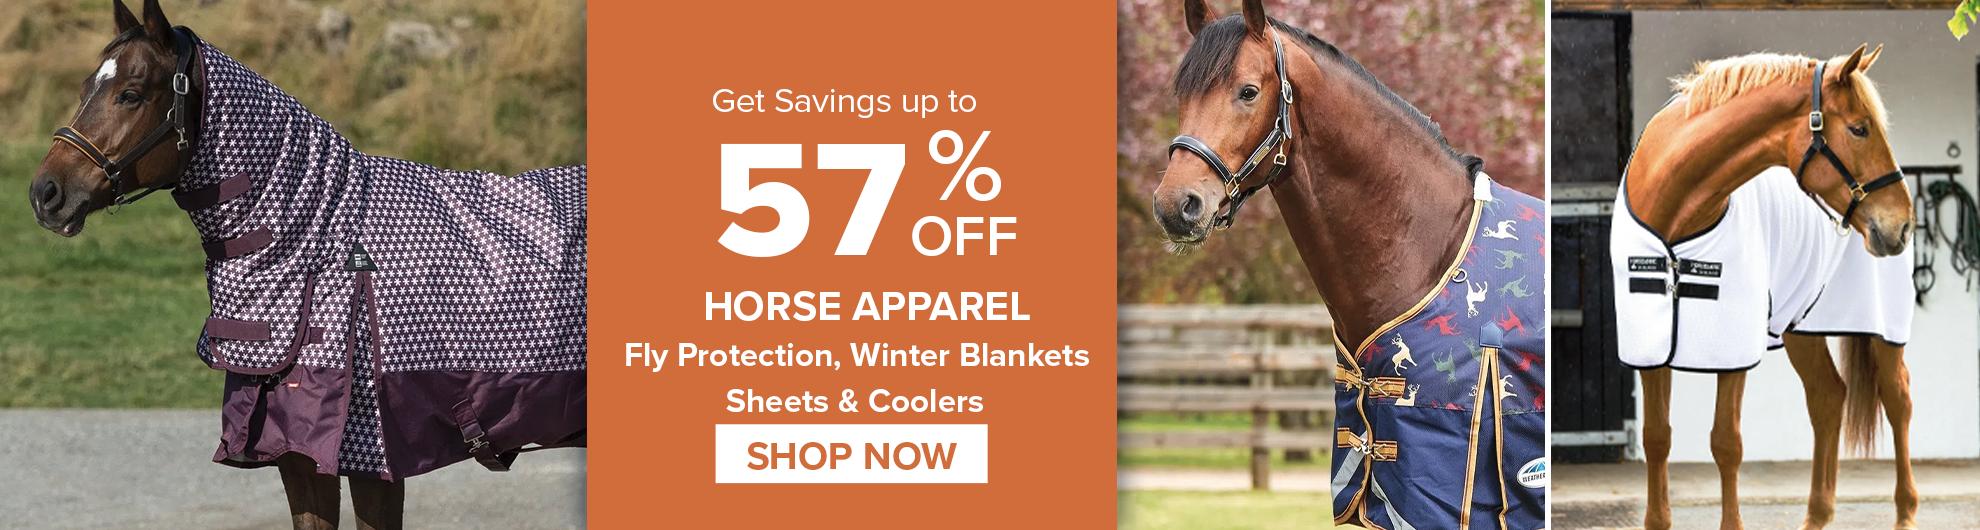 Horse apparel on Sale